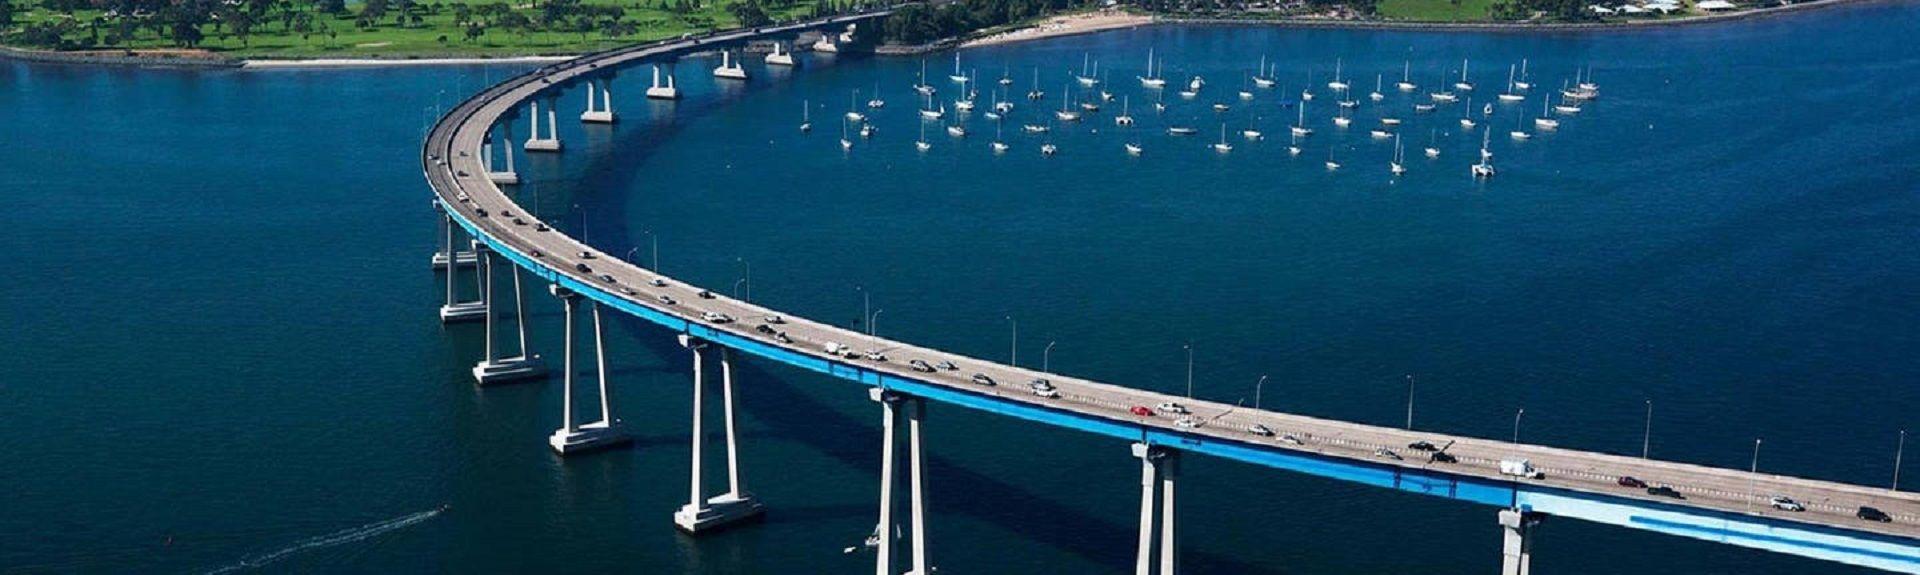 San Diego Coronado Bridge, Coronado, Californie, États-Unis d'Amérique